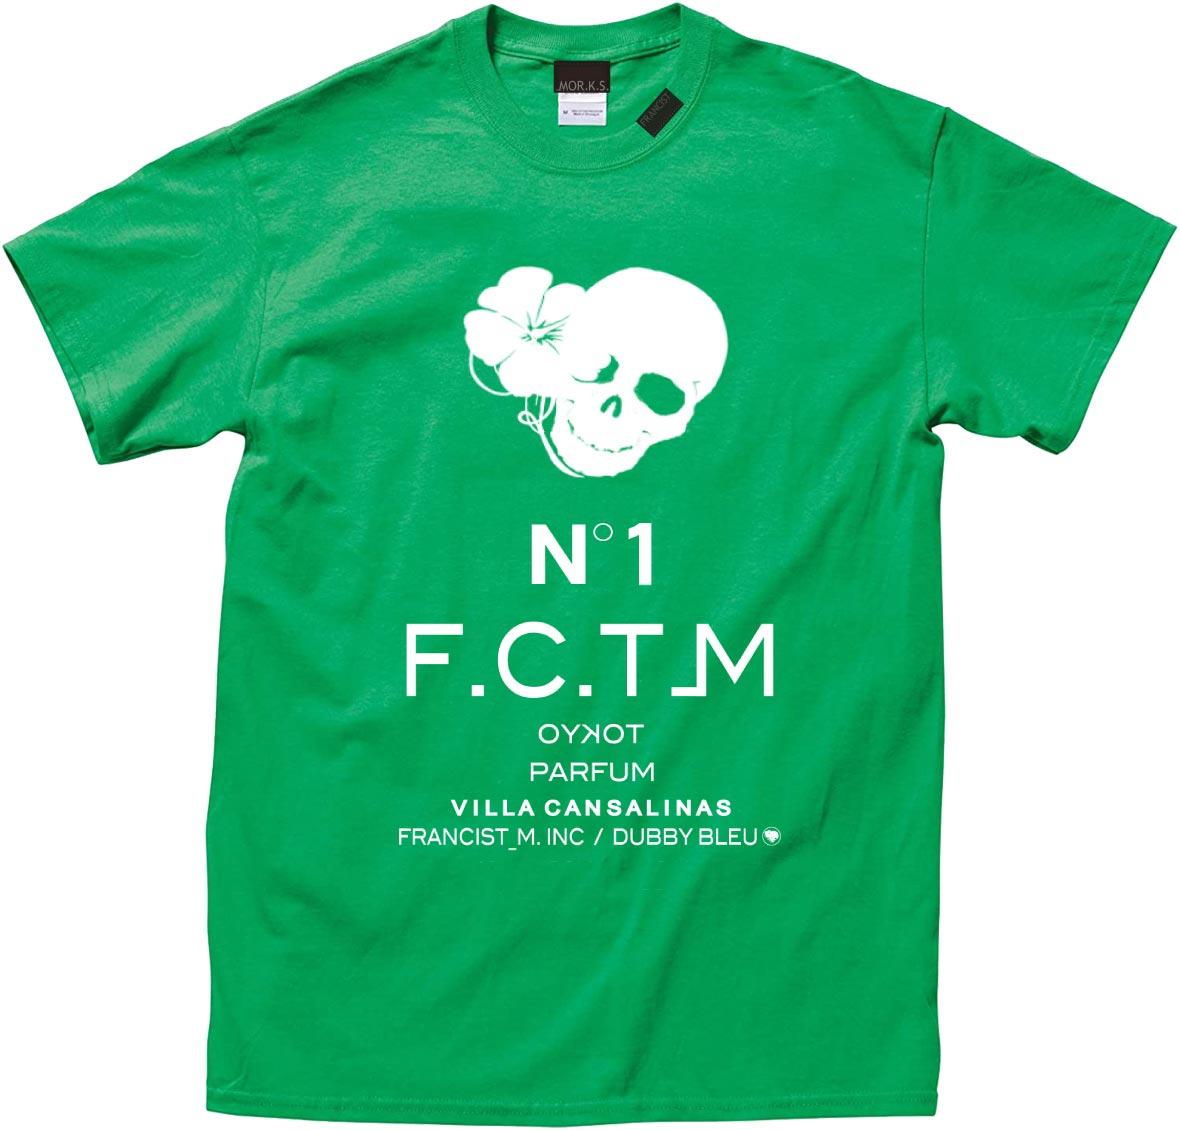 MT2839 US Body : HibiSkull N˚1 PARFUM TEE Shirt  #74 Green